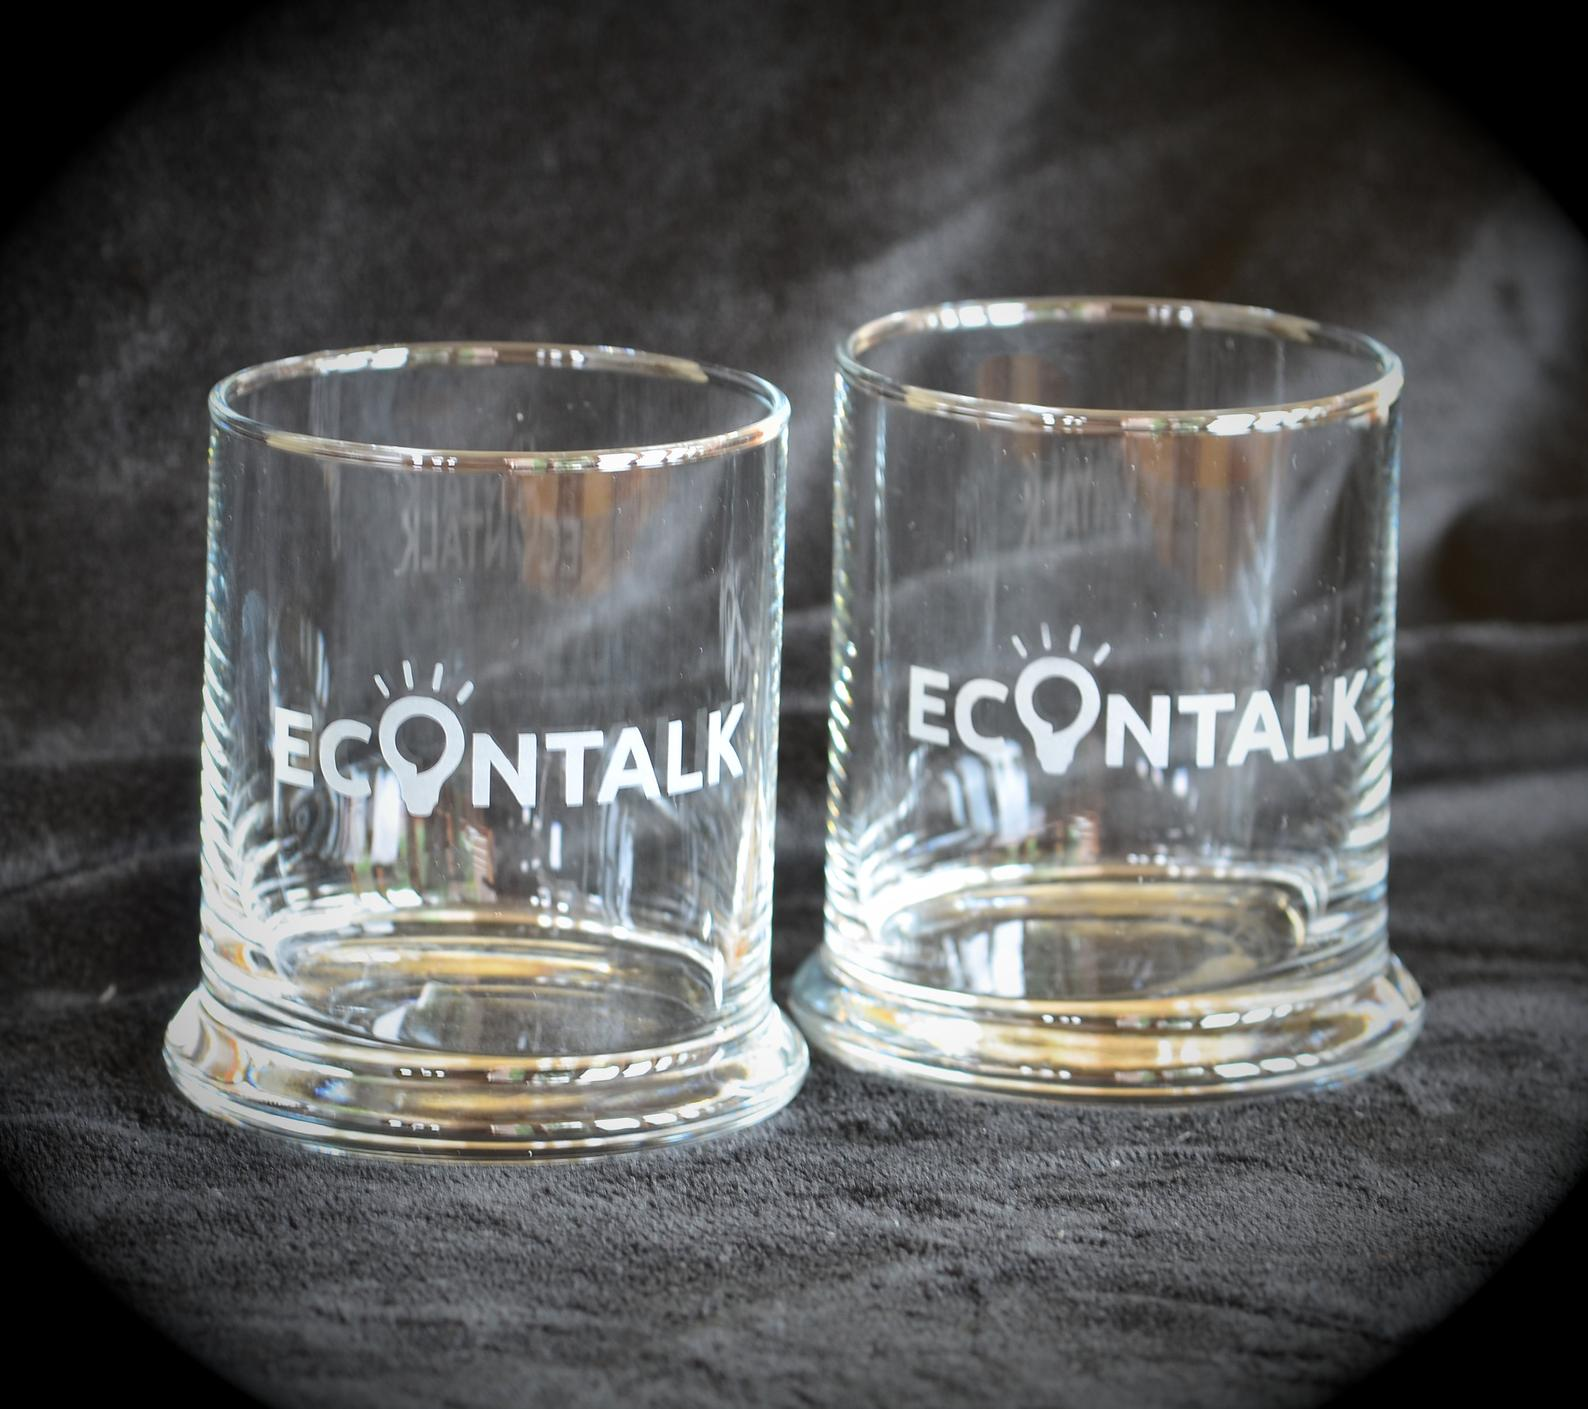 EconTalk Rock Glasses